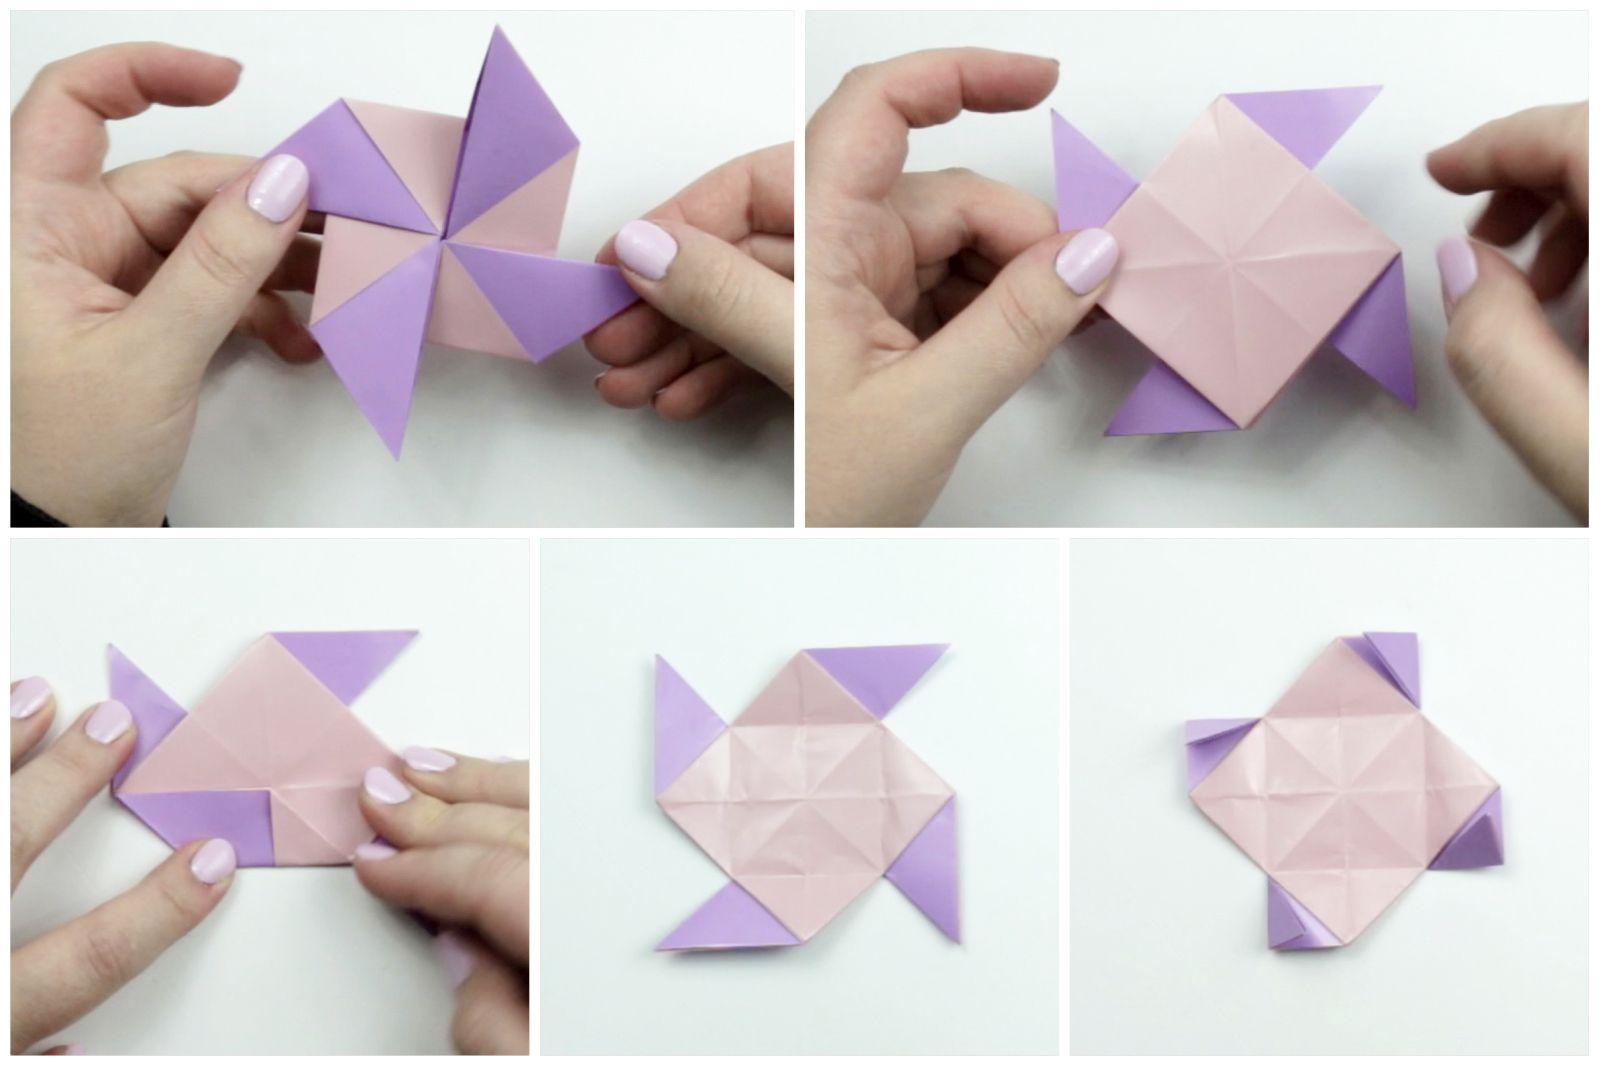 Origami Earrings being folded